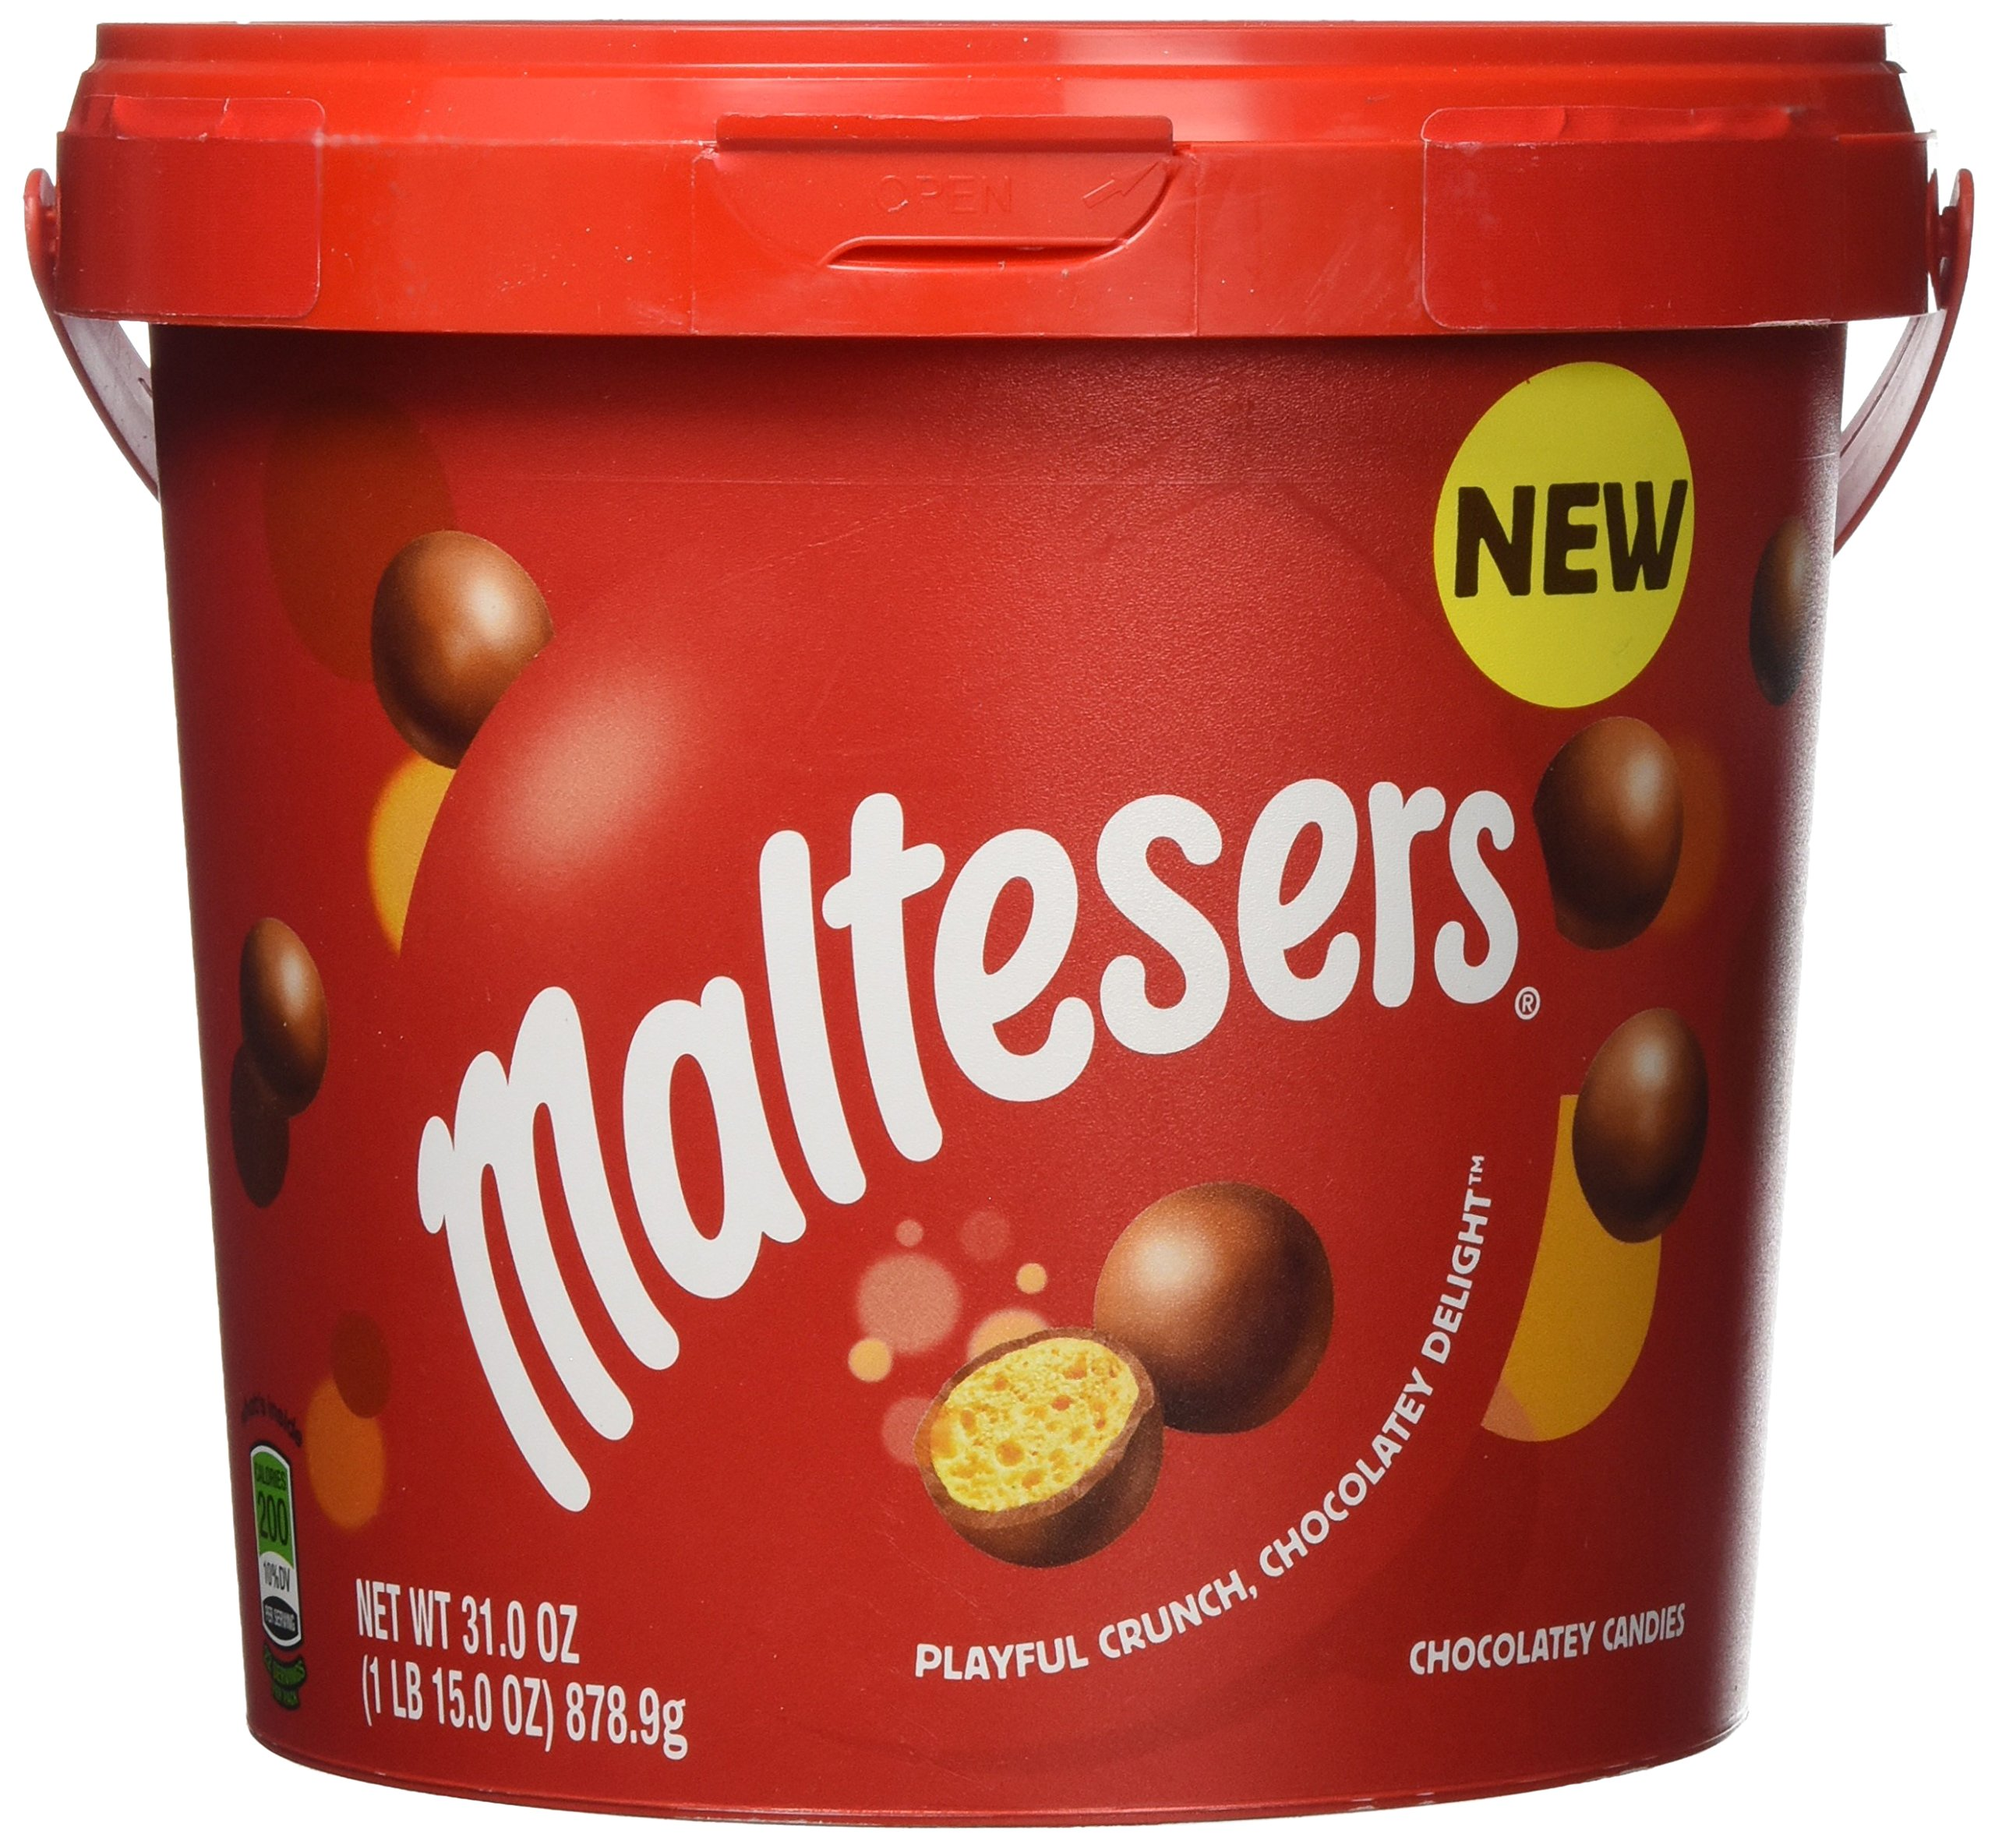 Mars Maltesers Party Bucket, 878g (1lb 15oz) by Mars